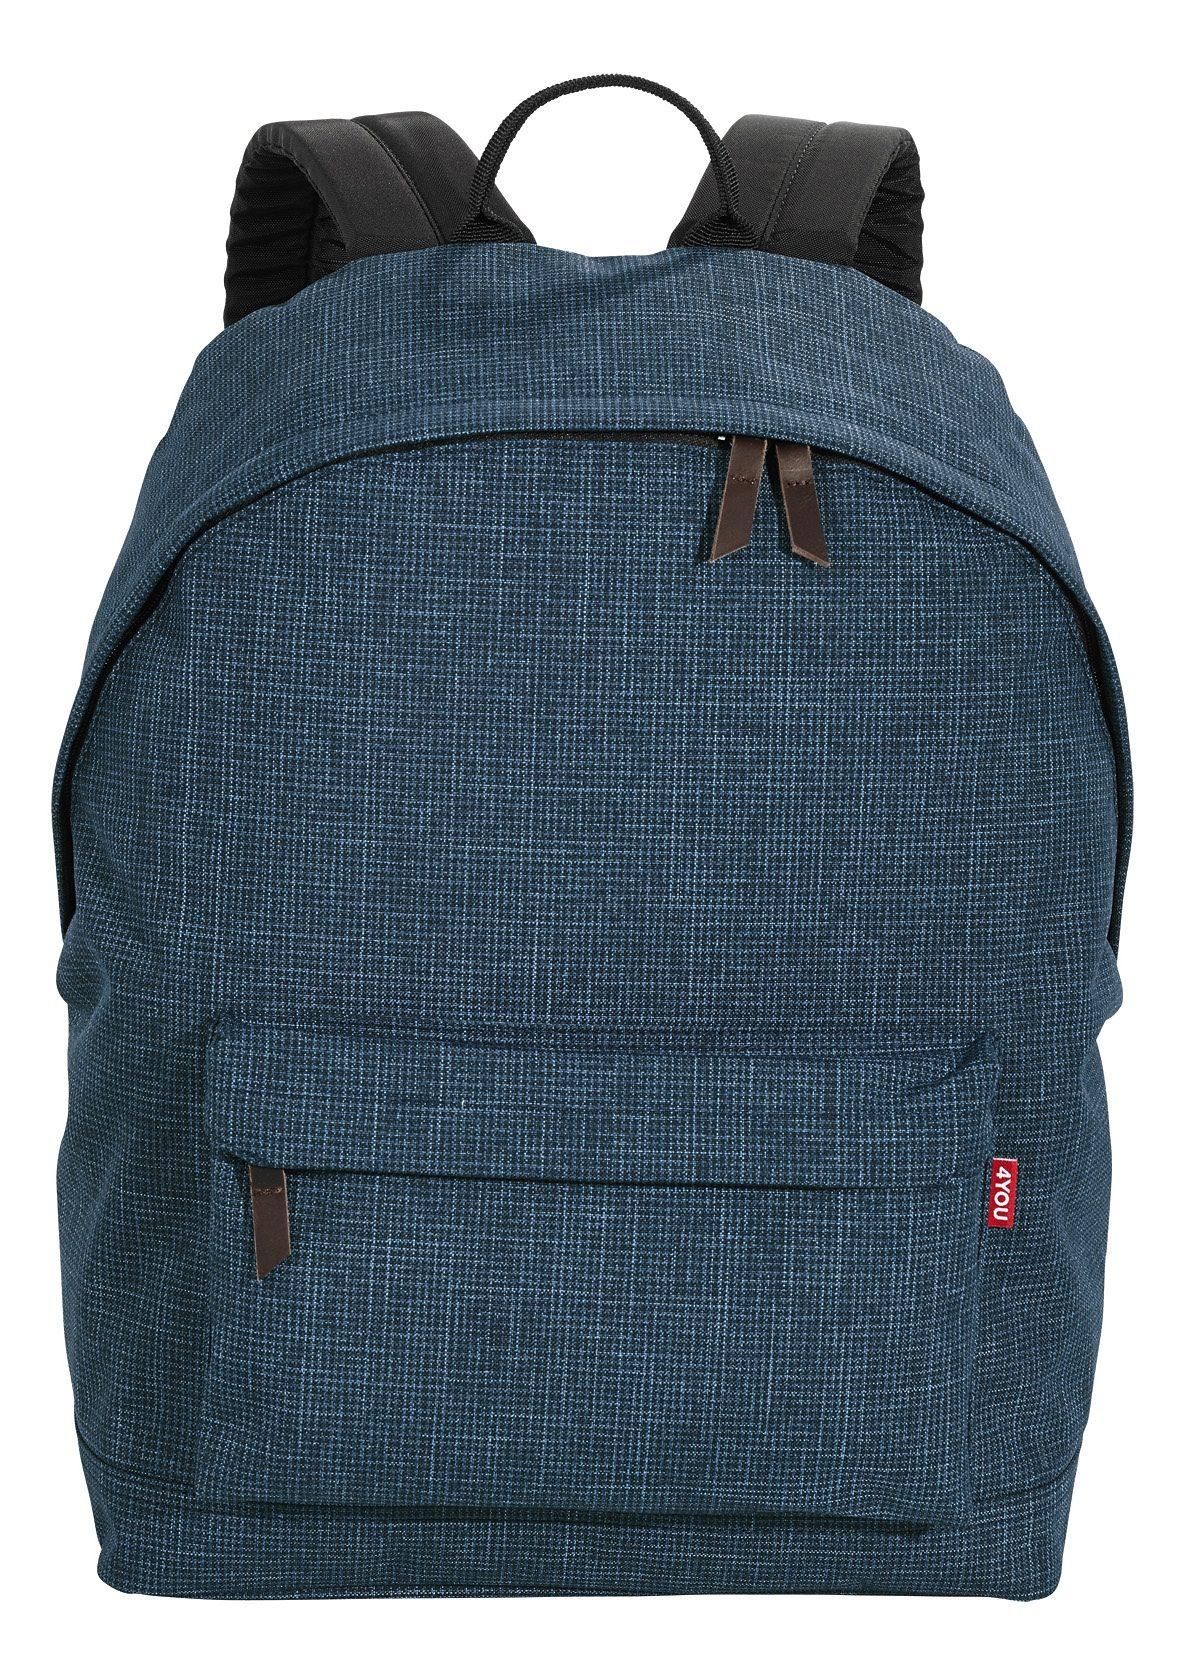 4YOU Rucksack, Pixel Blue, »Daypack«